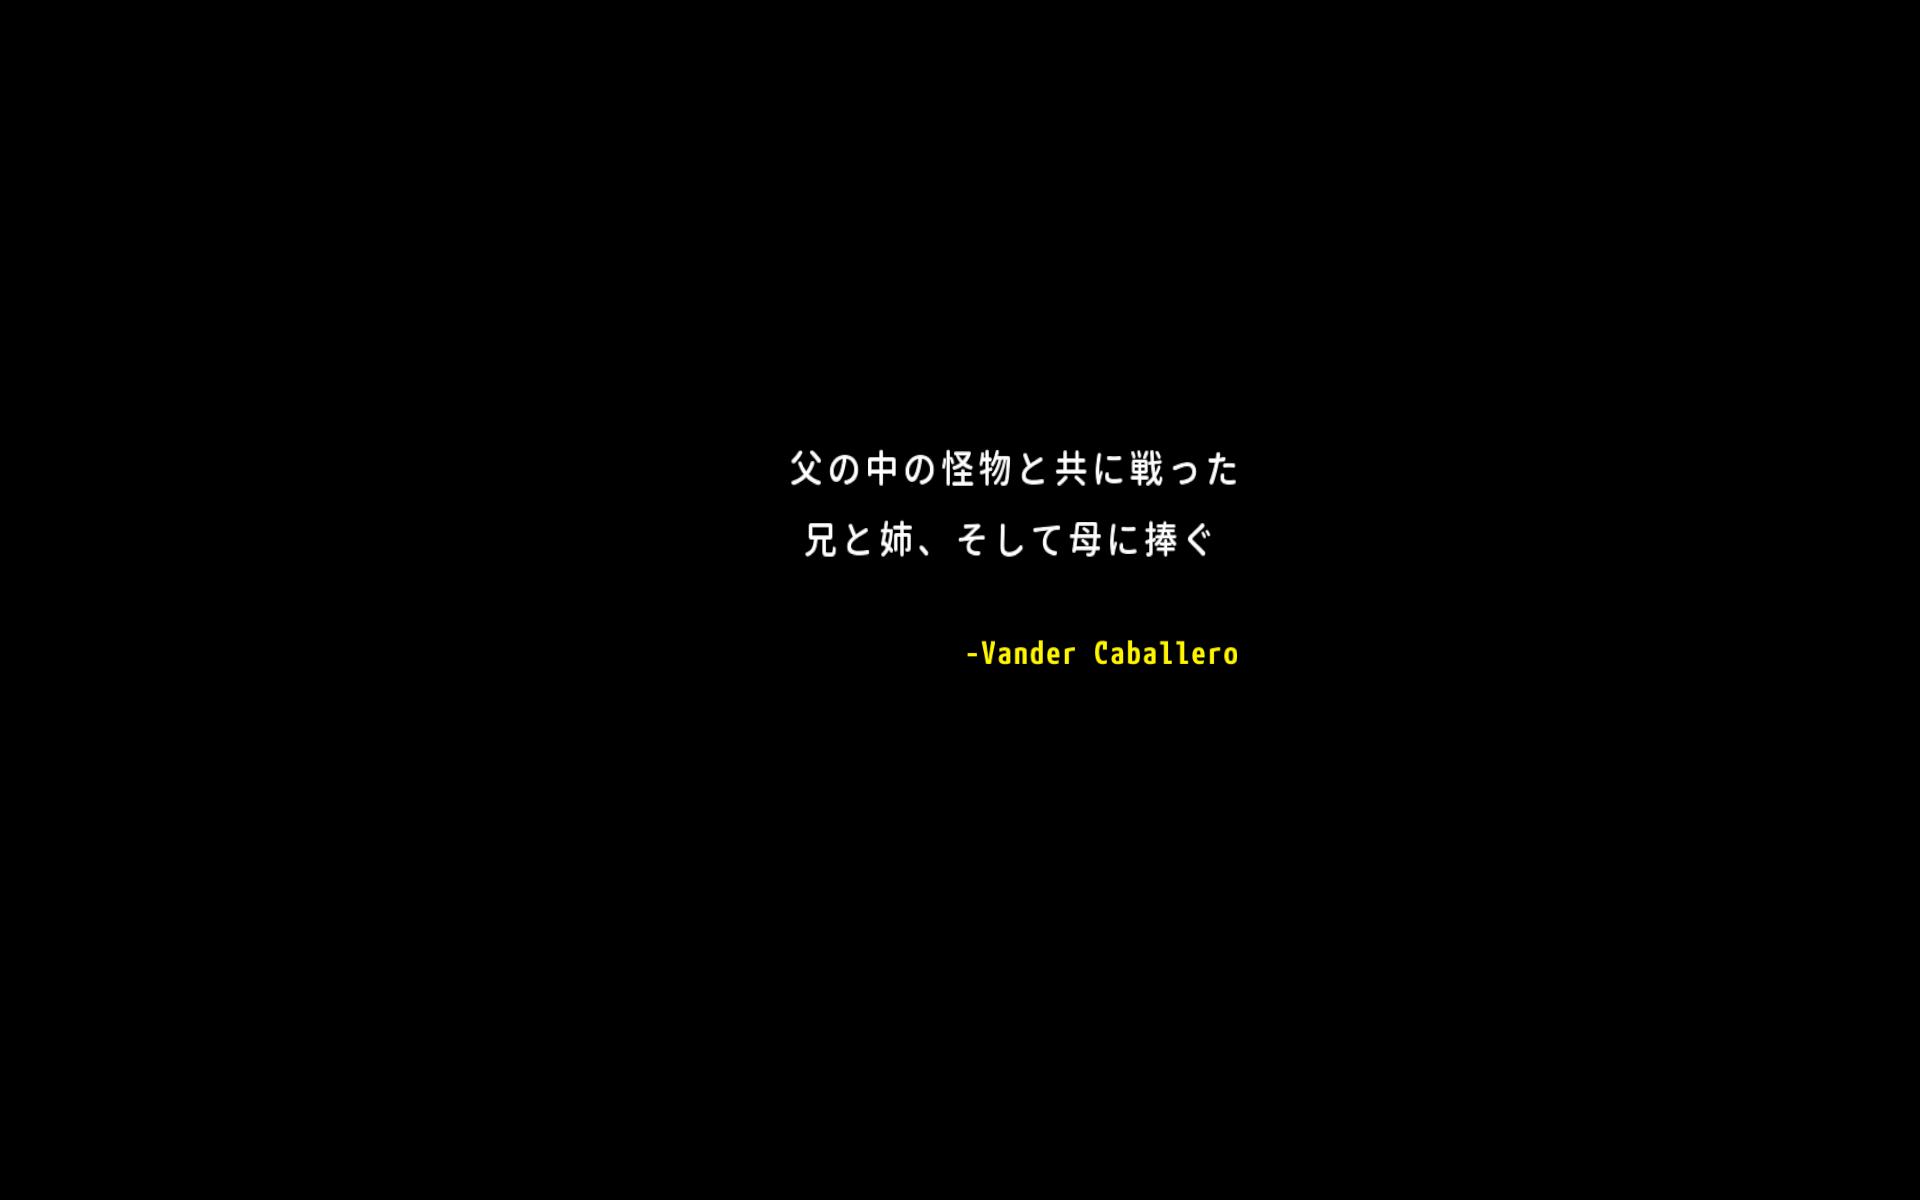 PC ゲーム Papo & Yo 日本語化メモ、日本語化後のスクリーンショット